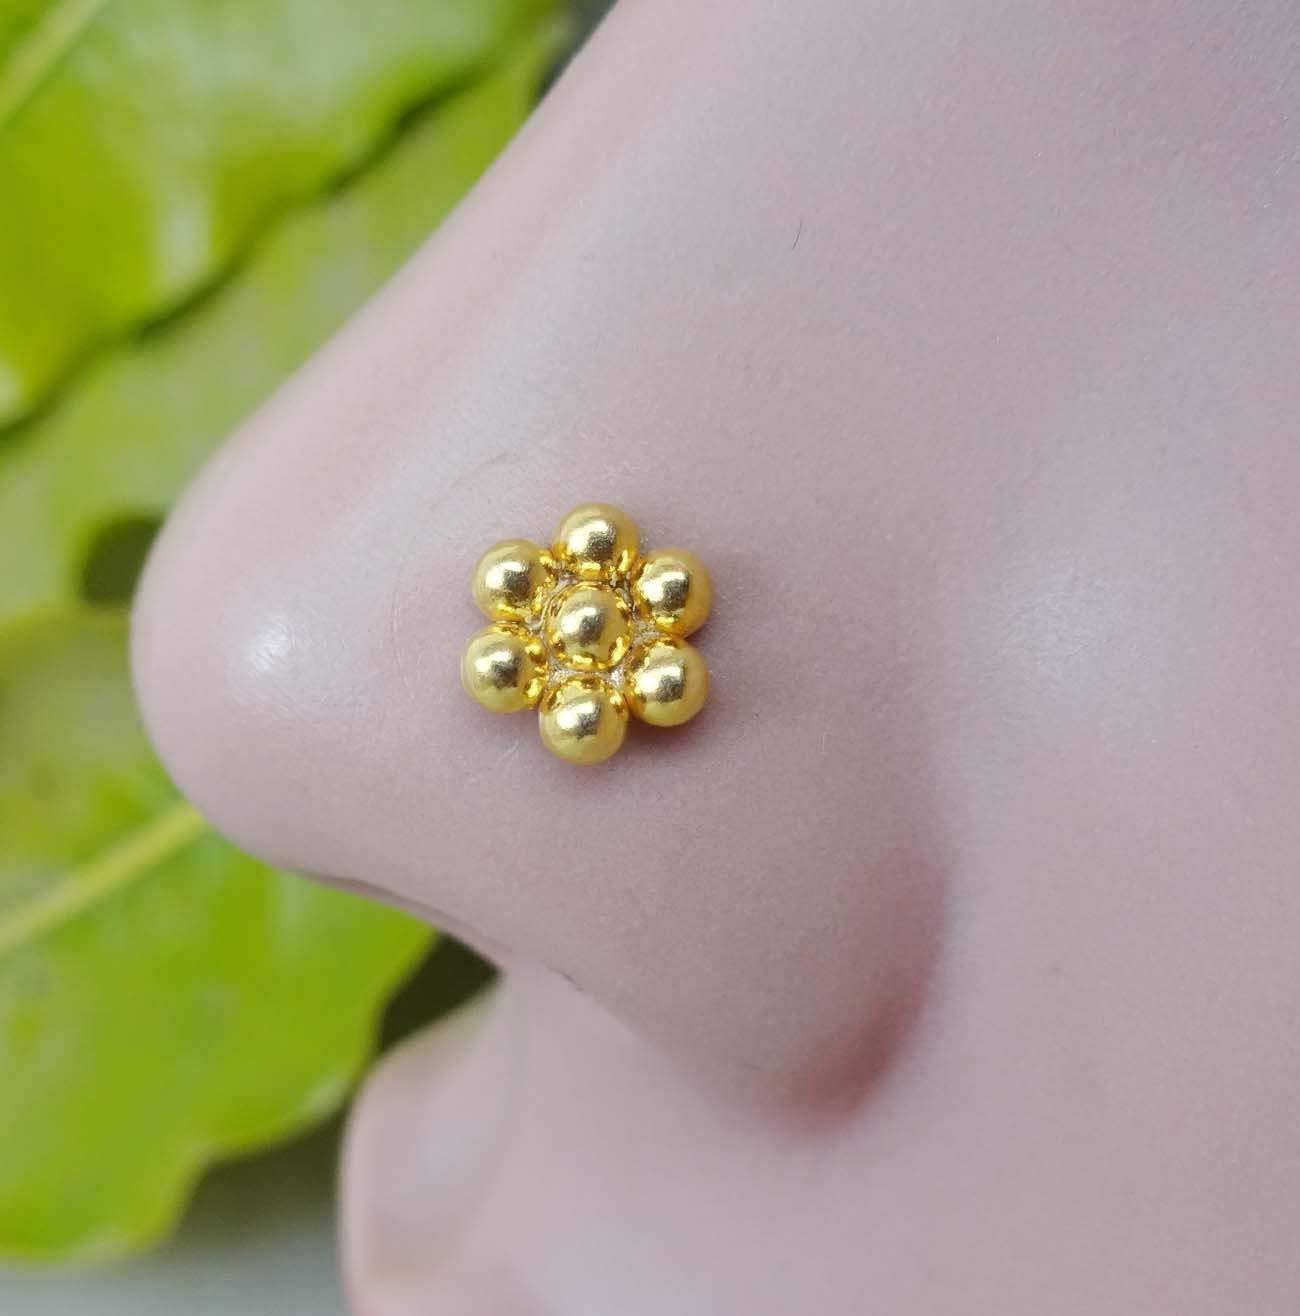 Cheap 1mm Gold Nose Stud Find 1mm Gold Nose Stud Deals On Line At